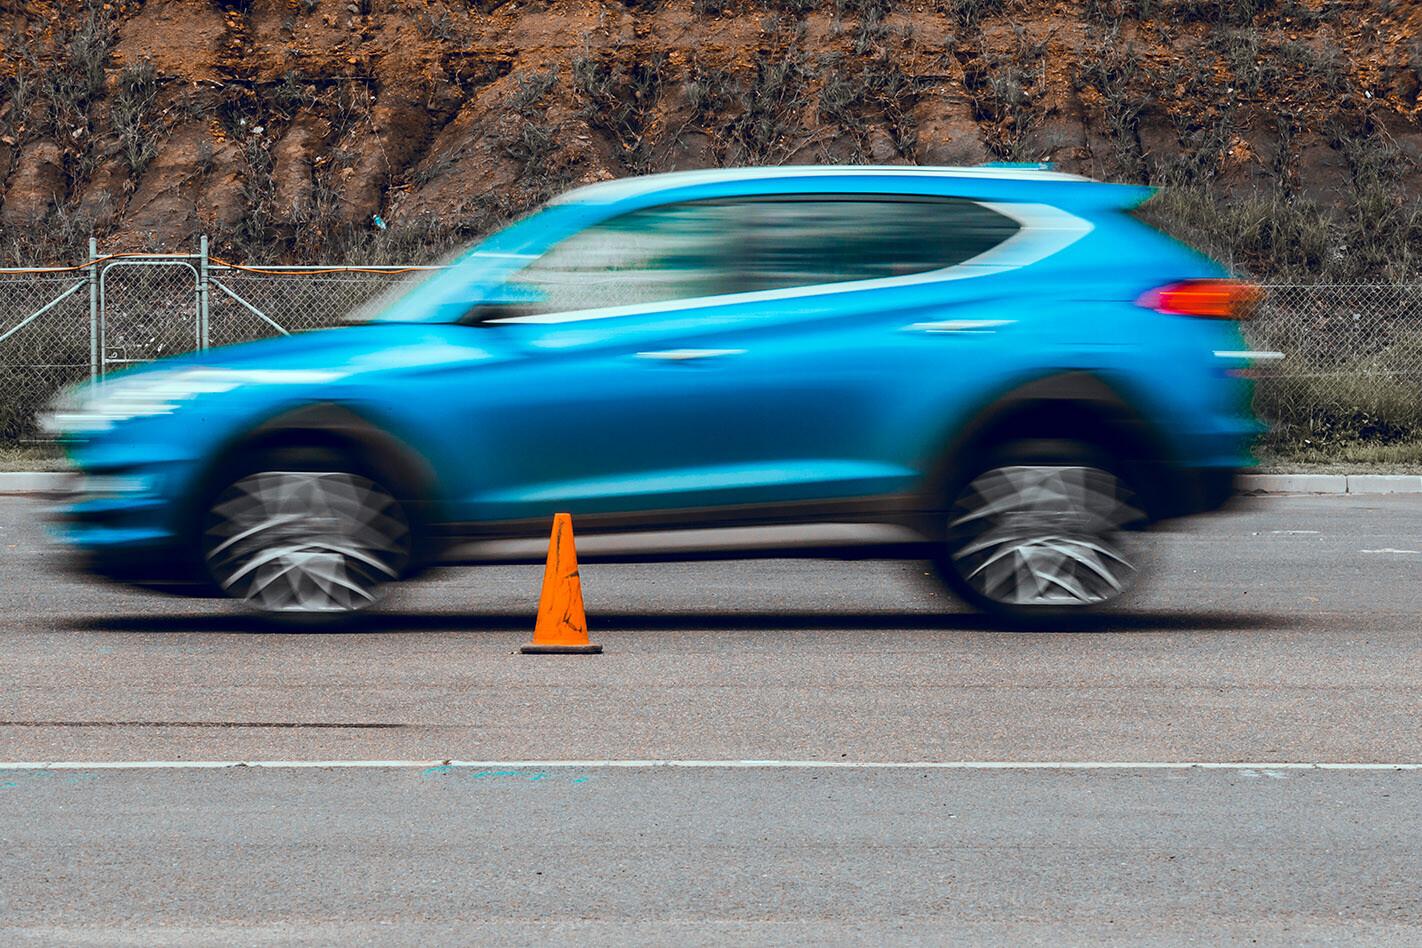 2020 Wheels Tyre Test Dry Braking Jpg